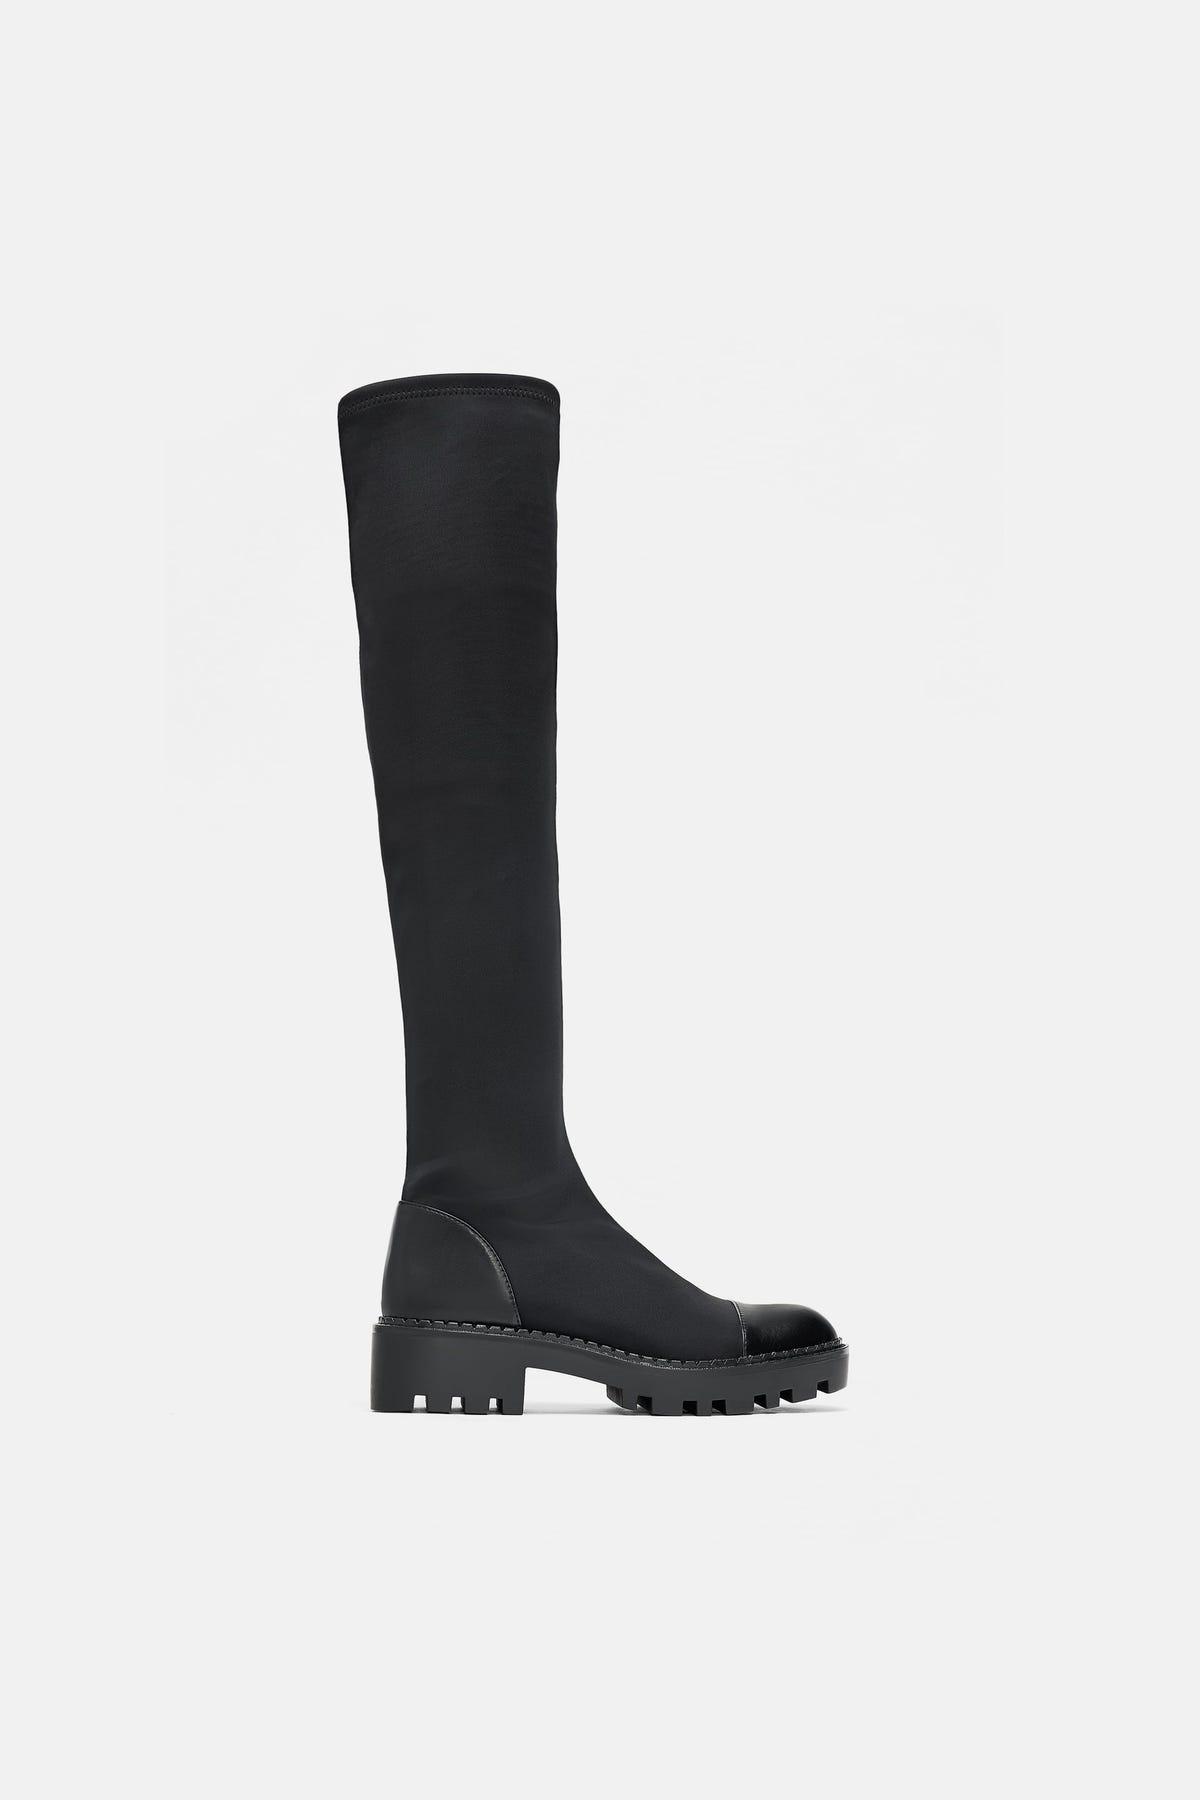 f89f27737d83d Womens Boots Trends - Best Winter 2019 Boot Styles